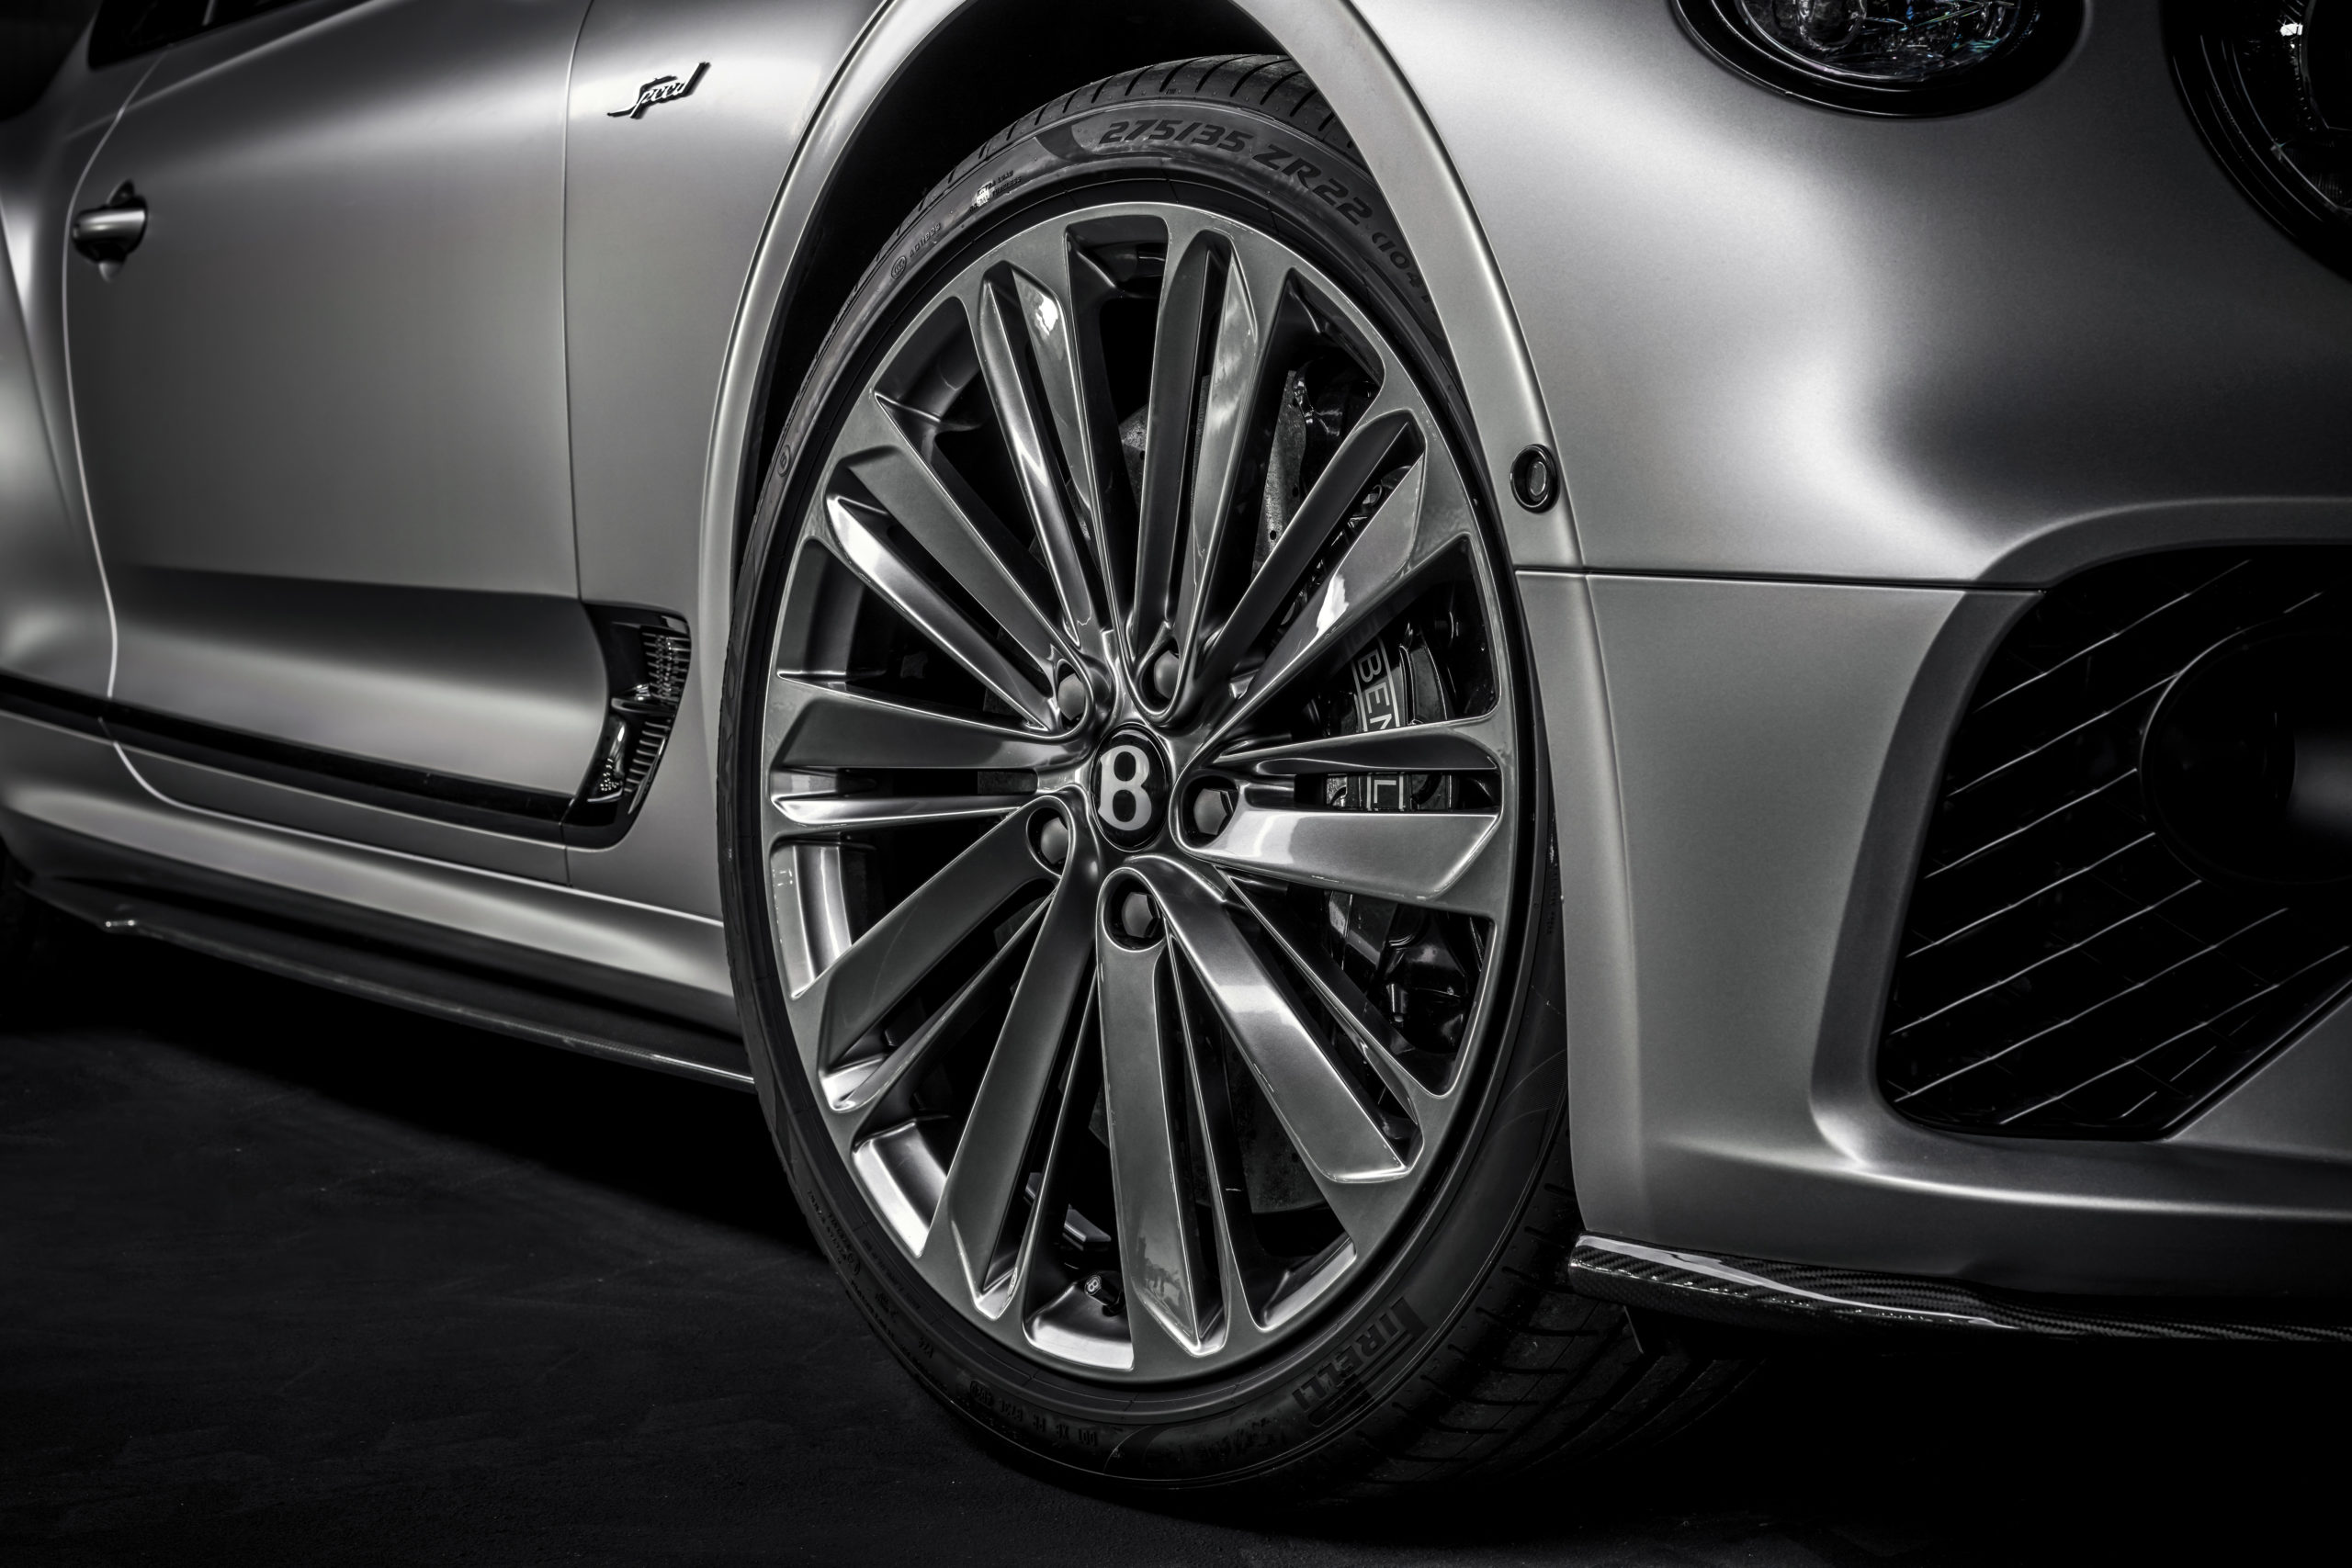 2022 Bentley Continental GT Speed 22-inch wheels